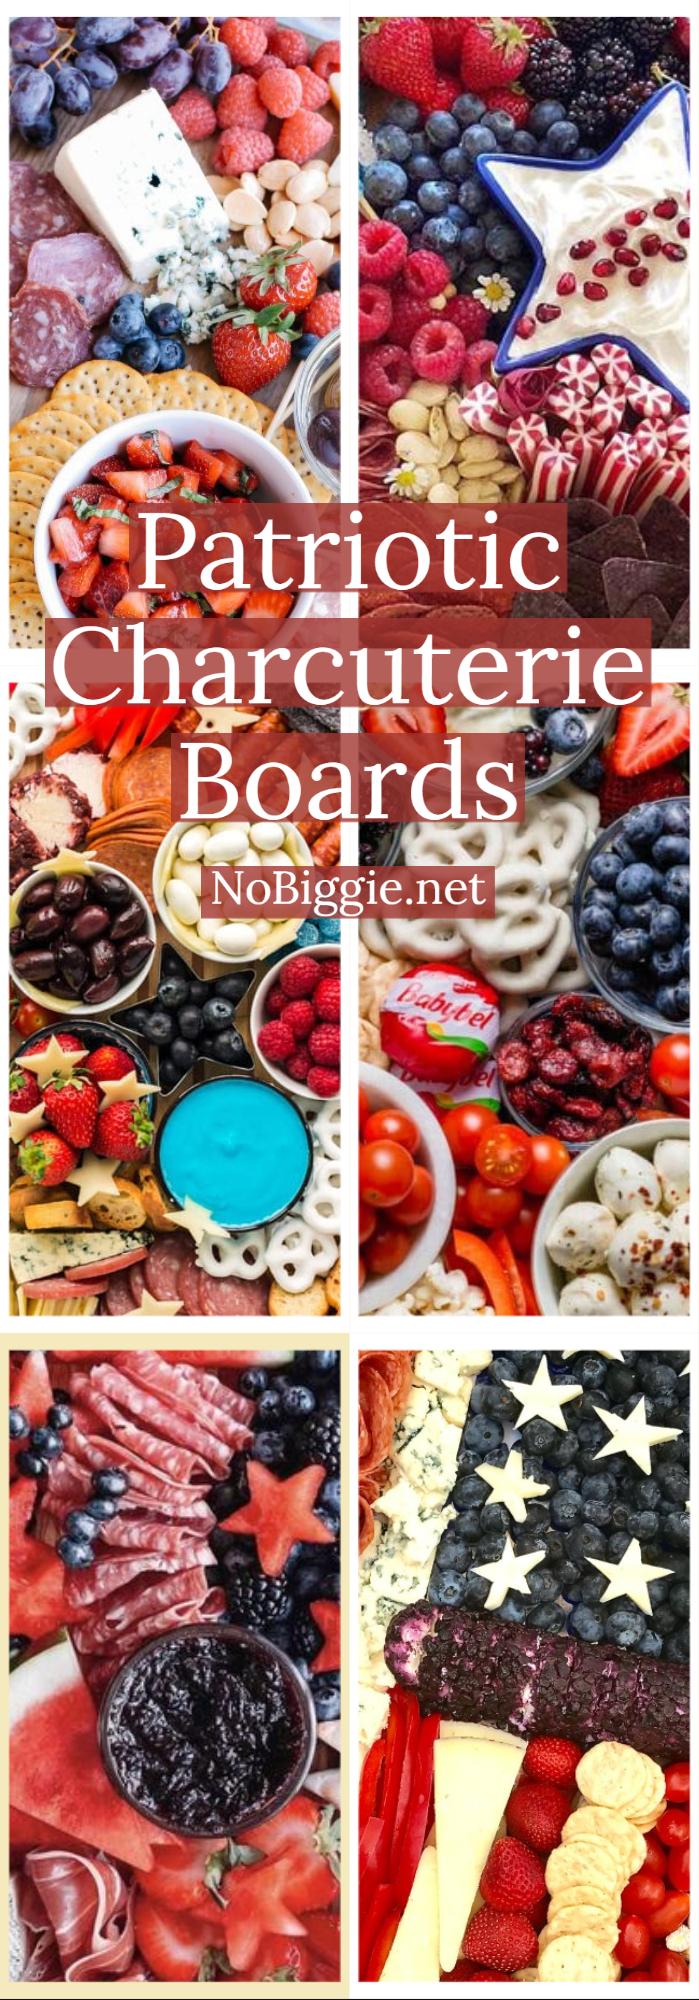 Patriotic Charcuterie Boards